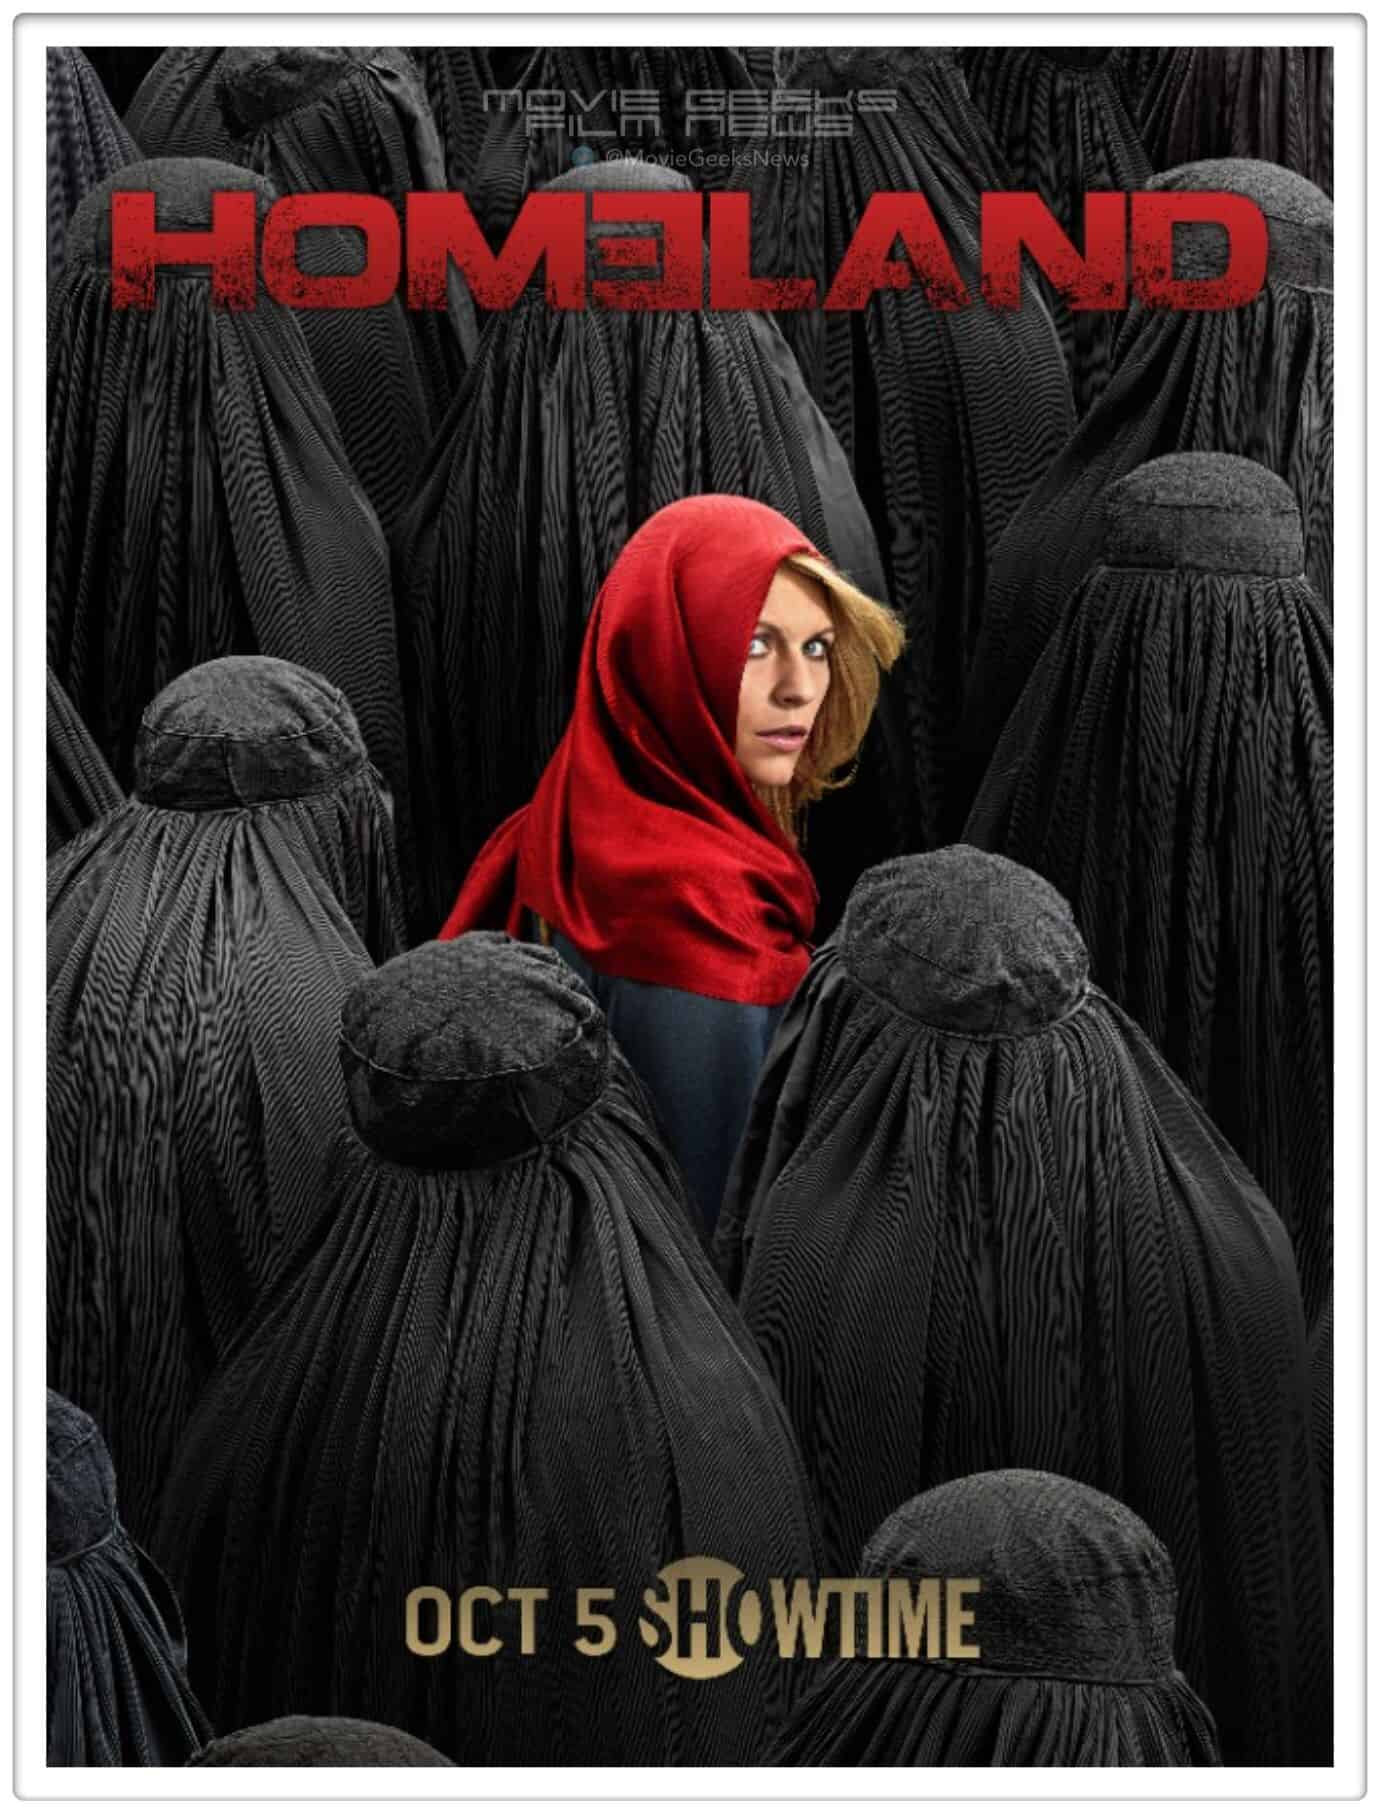 Homeland Season 4 แผนพิฆาตมาตุภูมิ ปี 4 พากย์ไทย EP1 – EP12 [จบ]